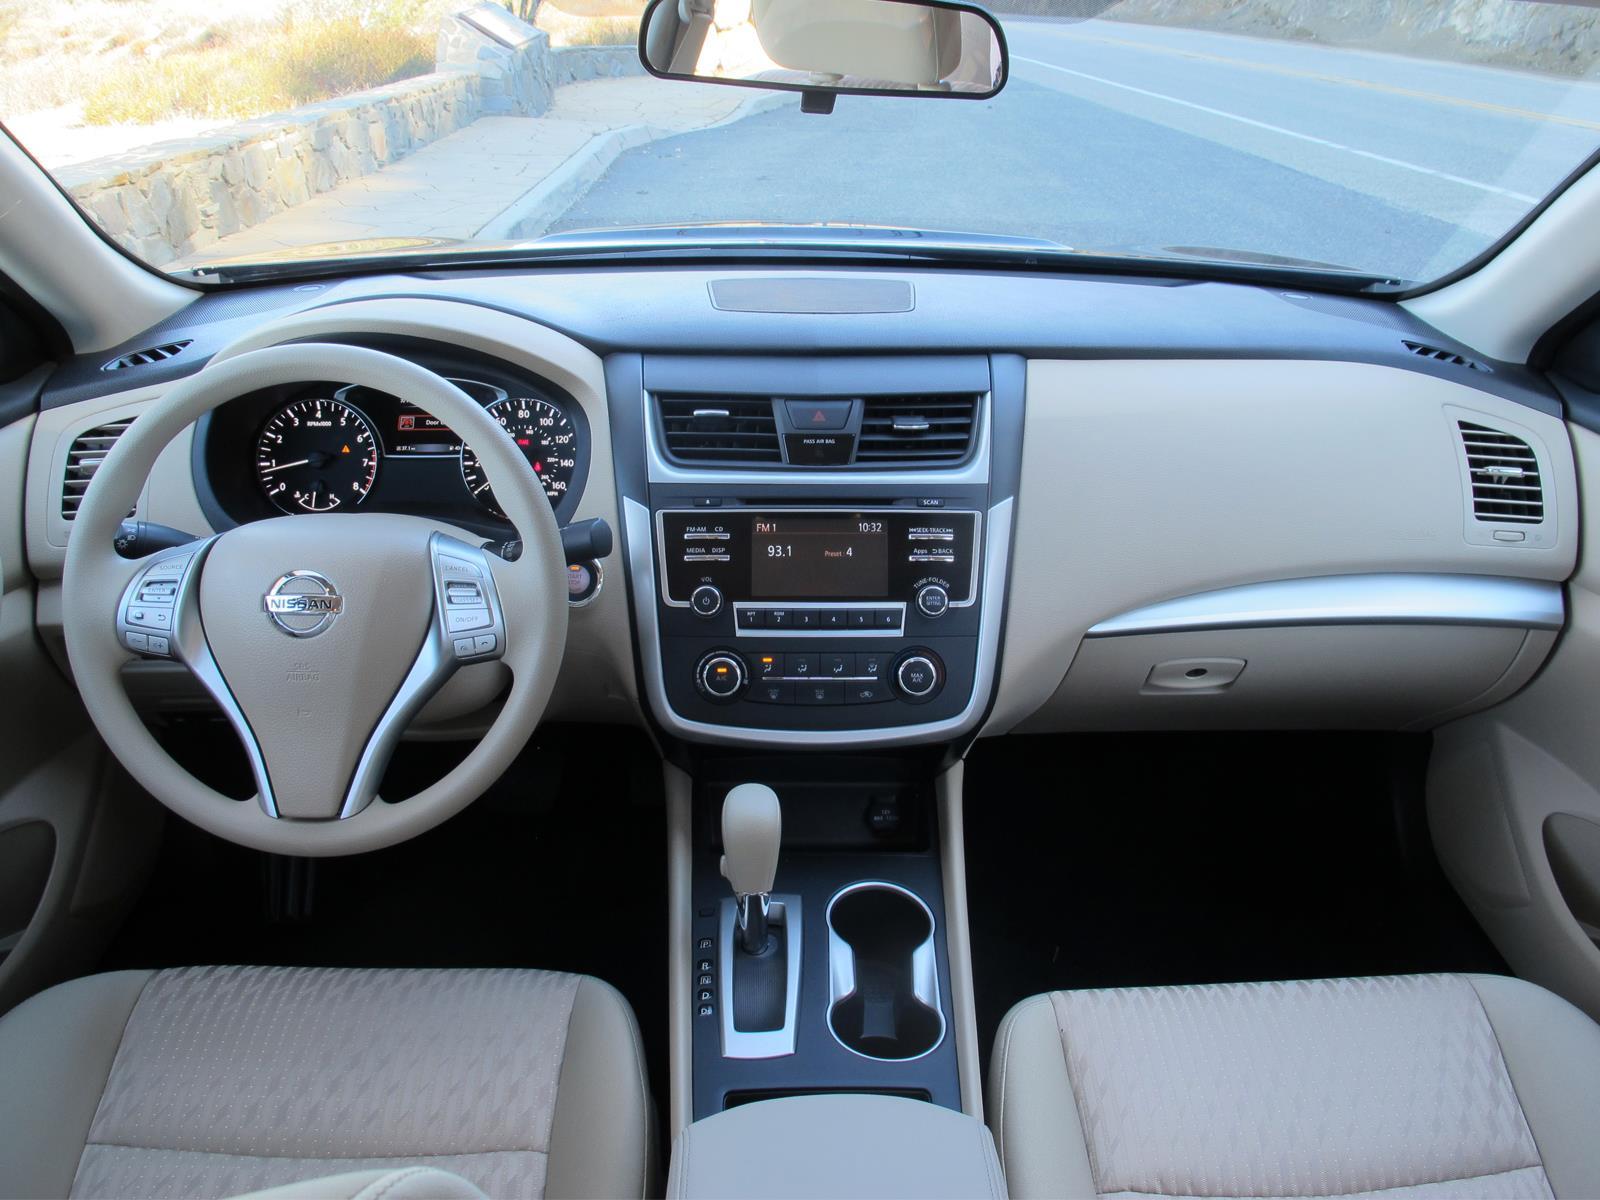 Nissan Altima 2017 - Autocosmos.com